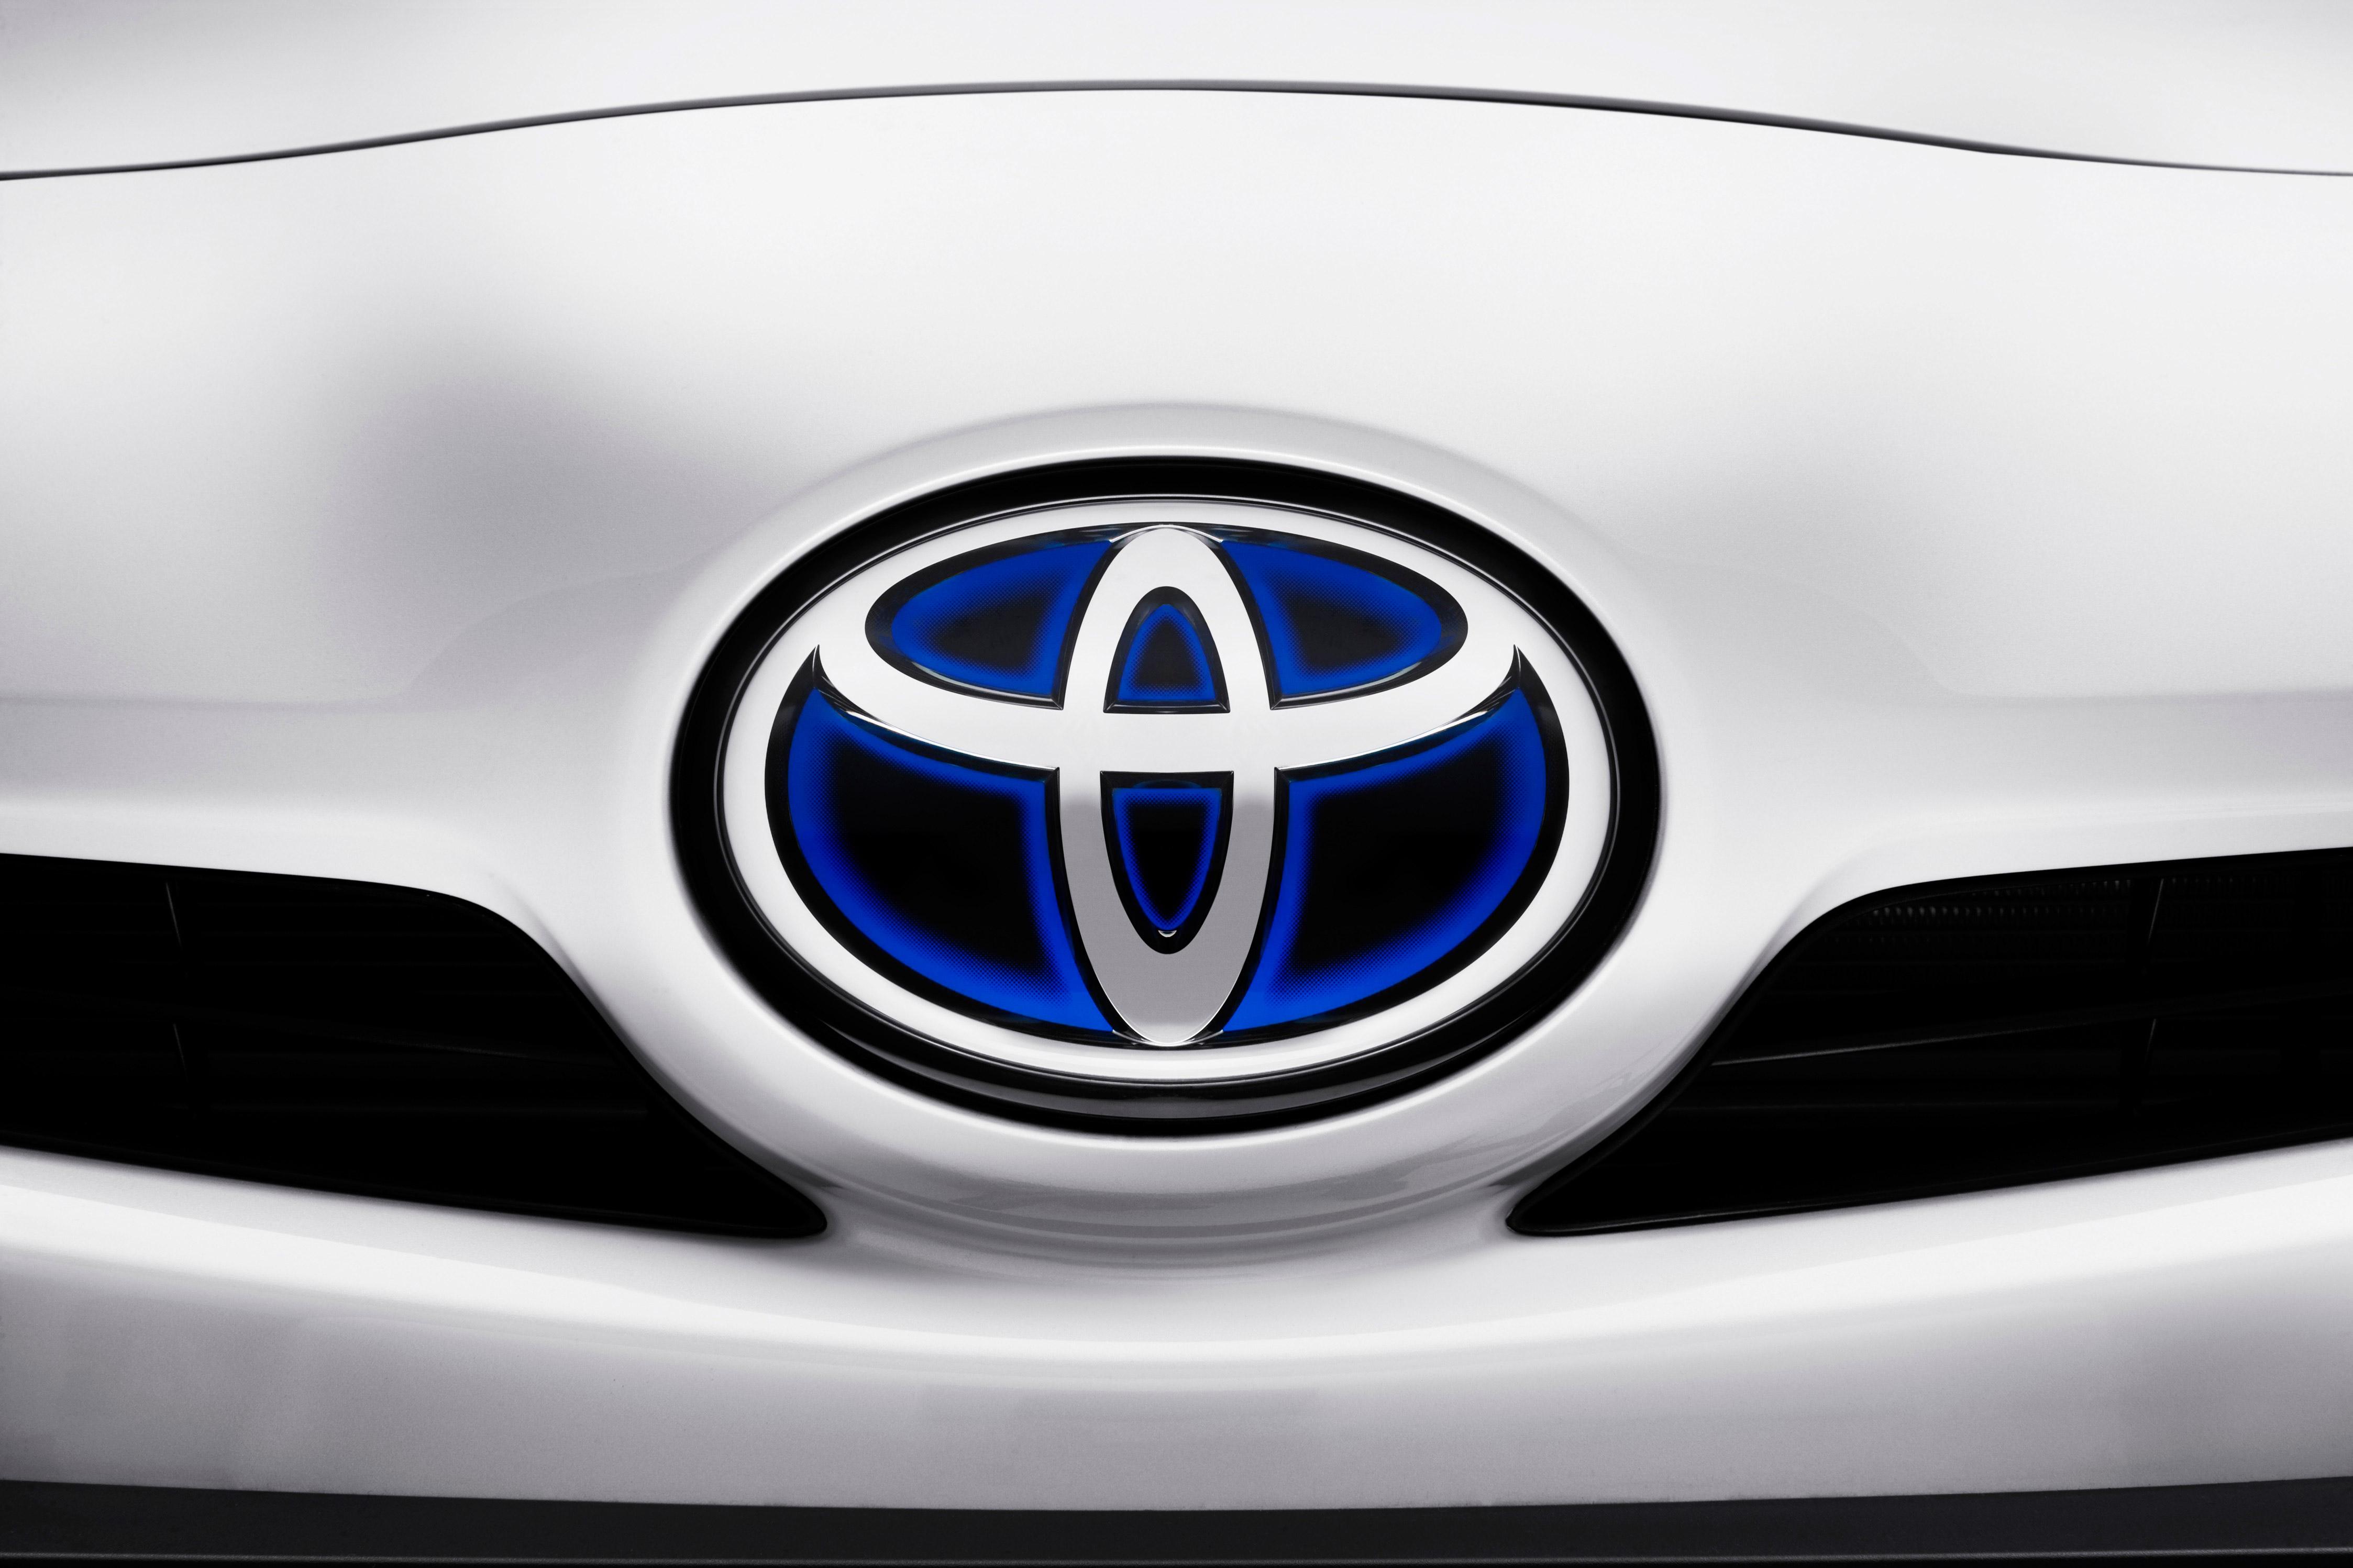 A Beautiful Collection of Car Logos amp Car Wallpapers HD 4493x2995